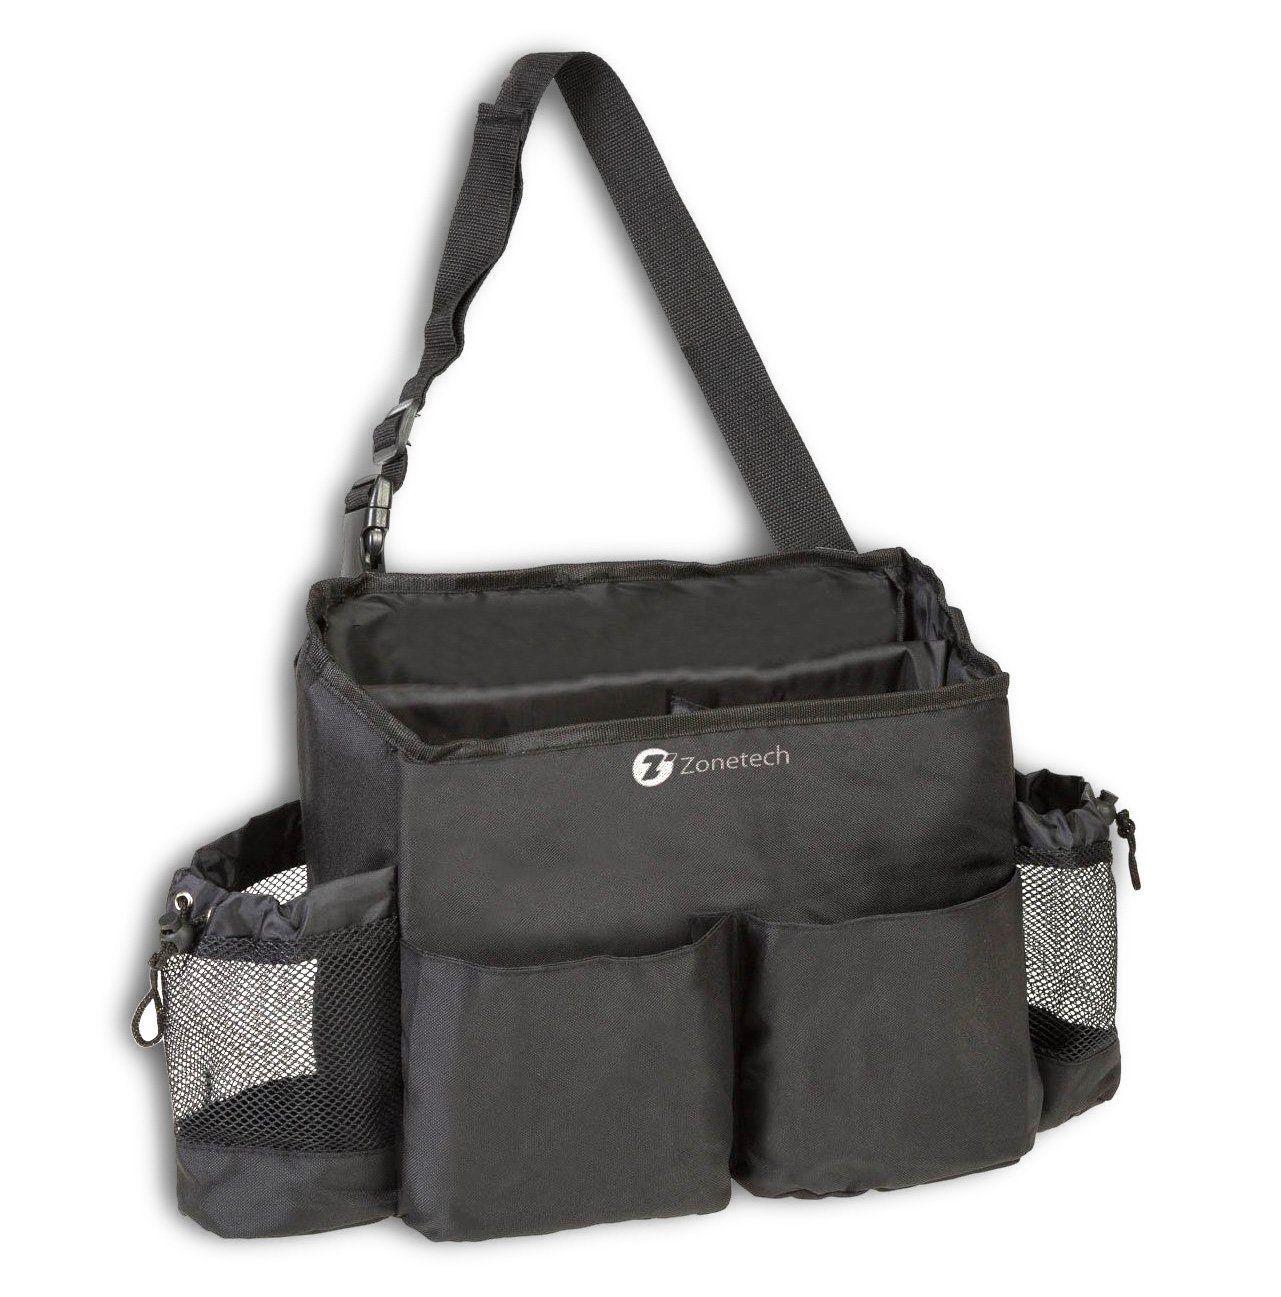 Zone Tech Bag Clutter Swing Organizer Storage Case